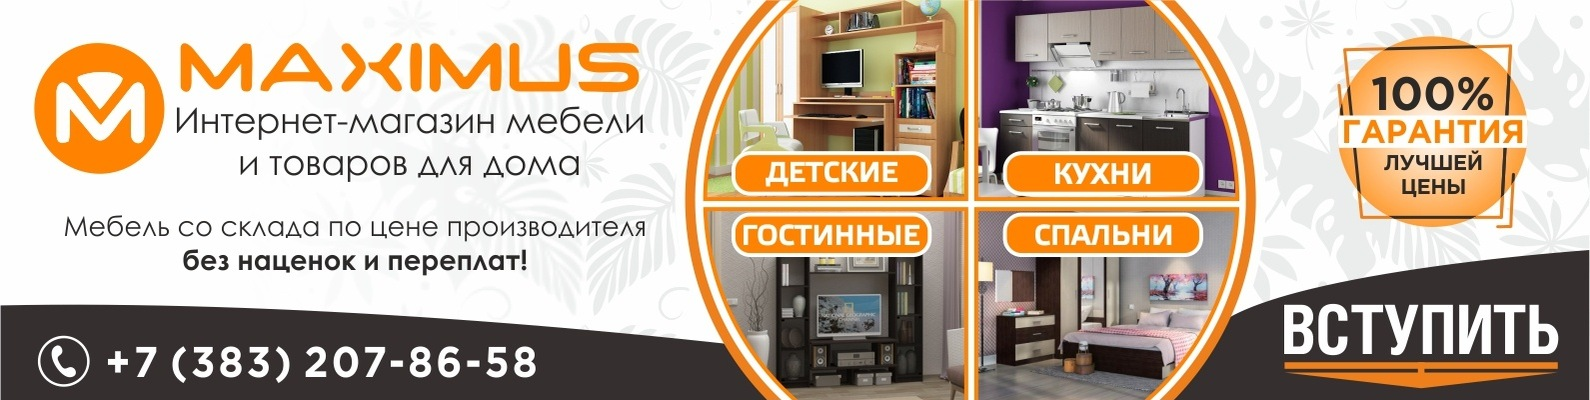 магазин мебели Maximus мебель по низким ценам вконтакте